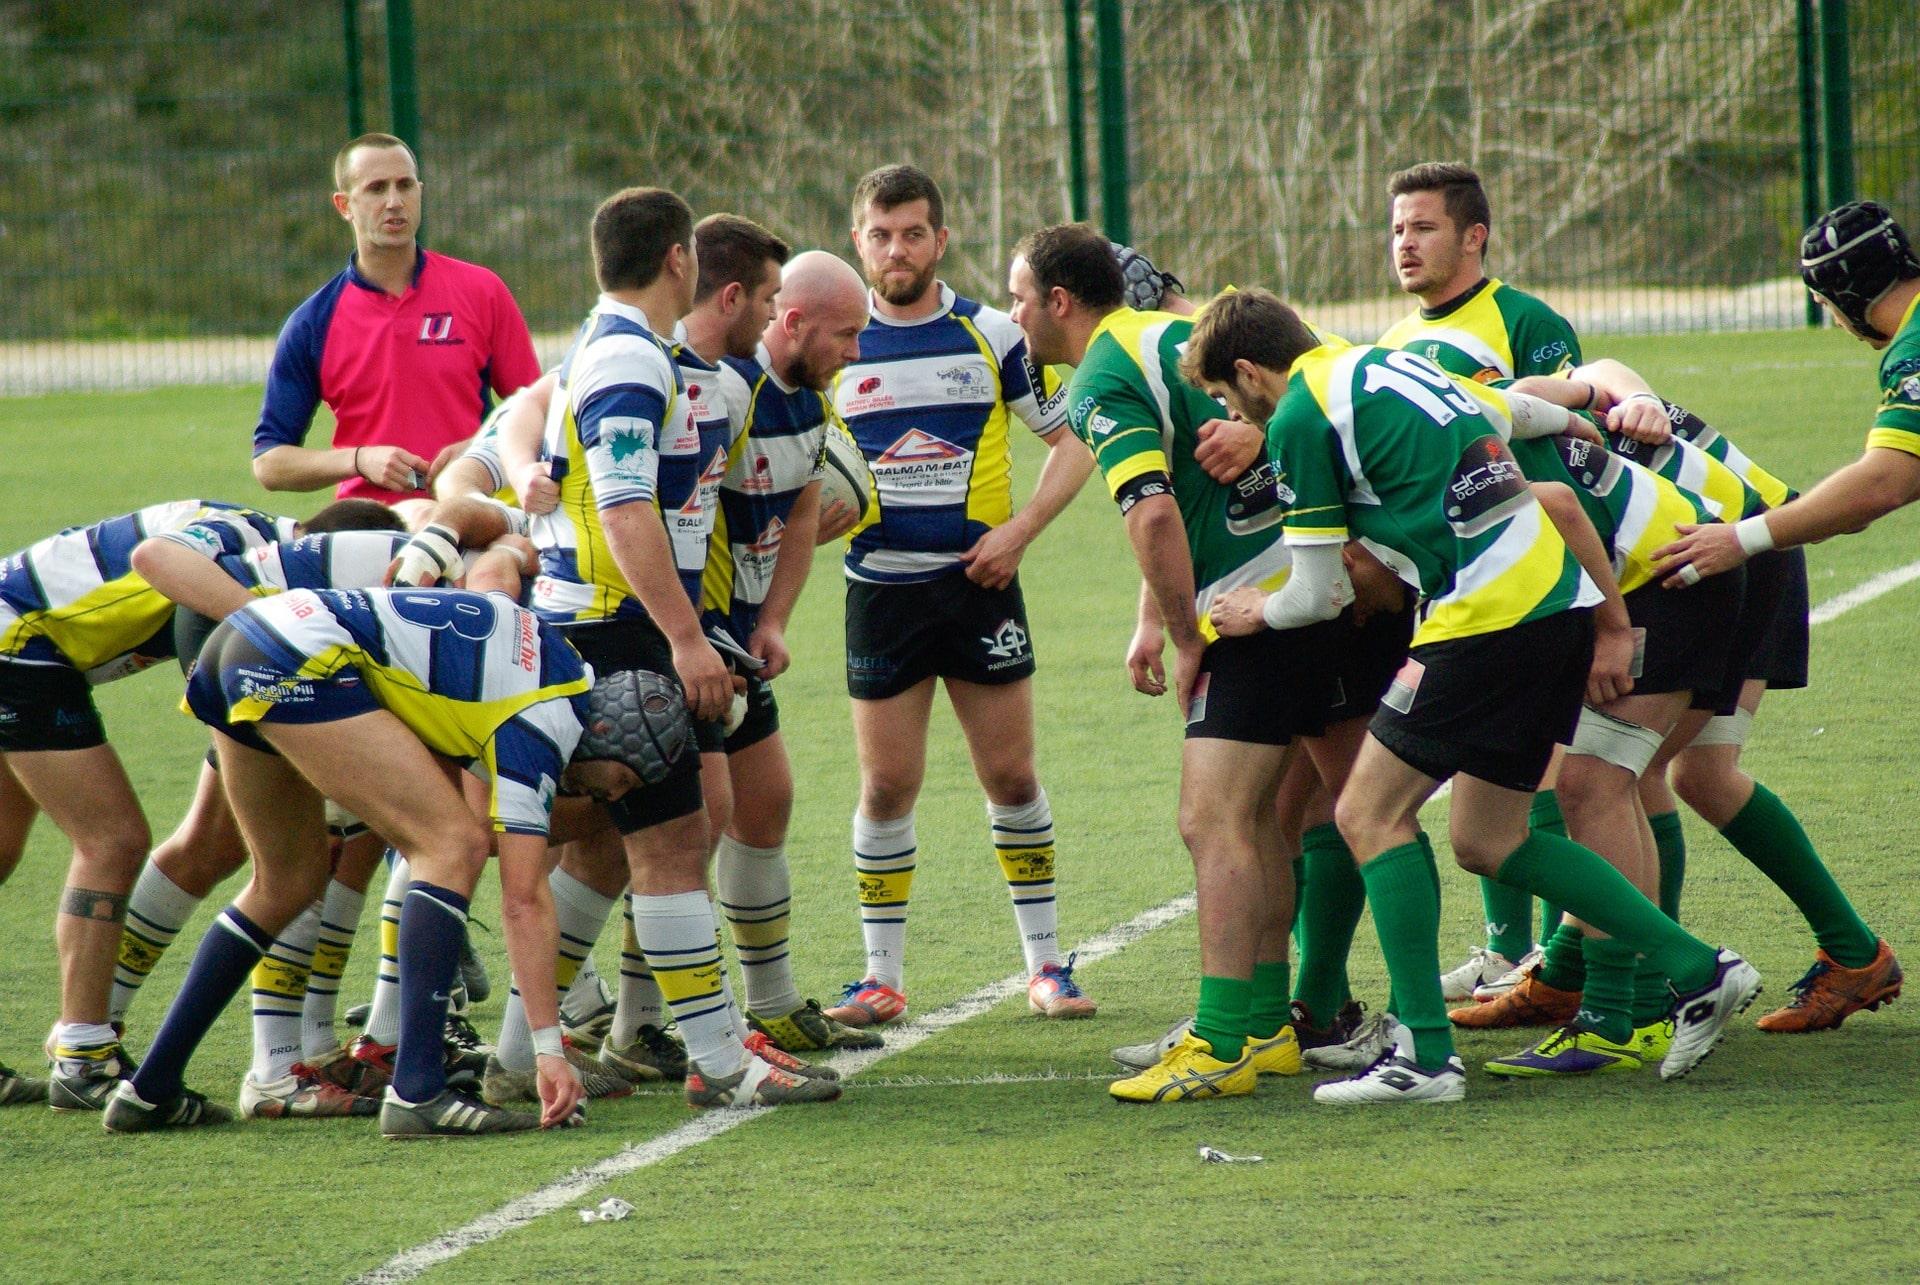 rugby-655036_1920-min.jpg